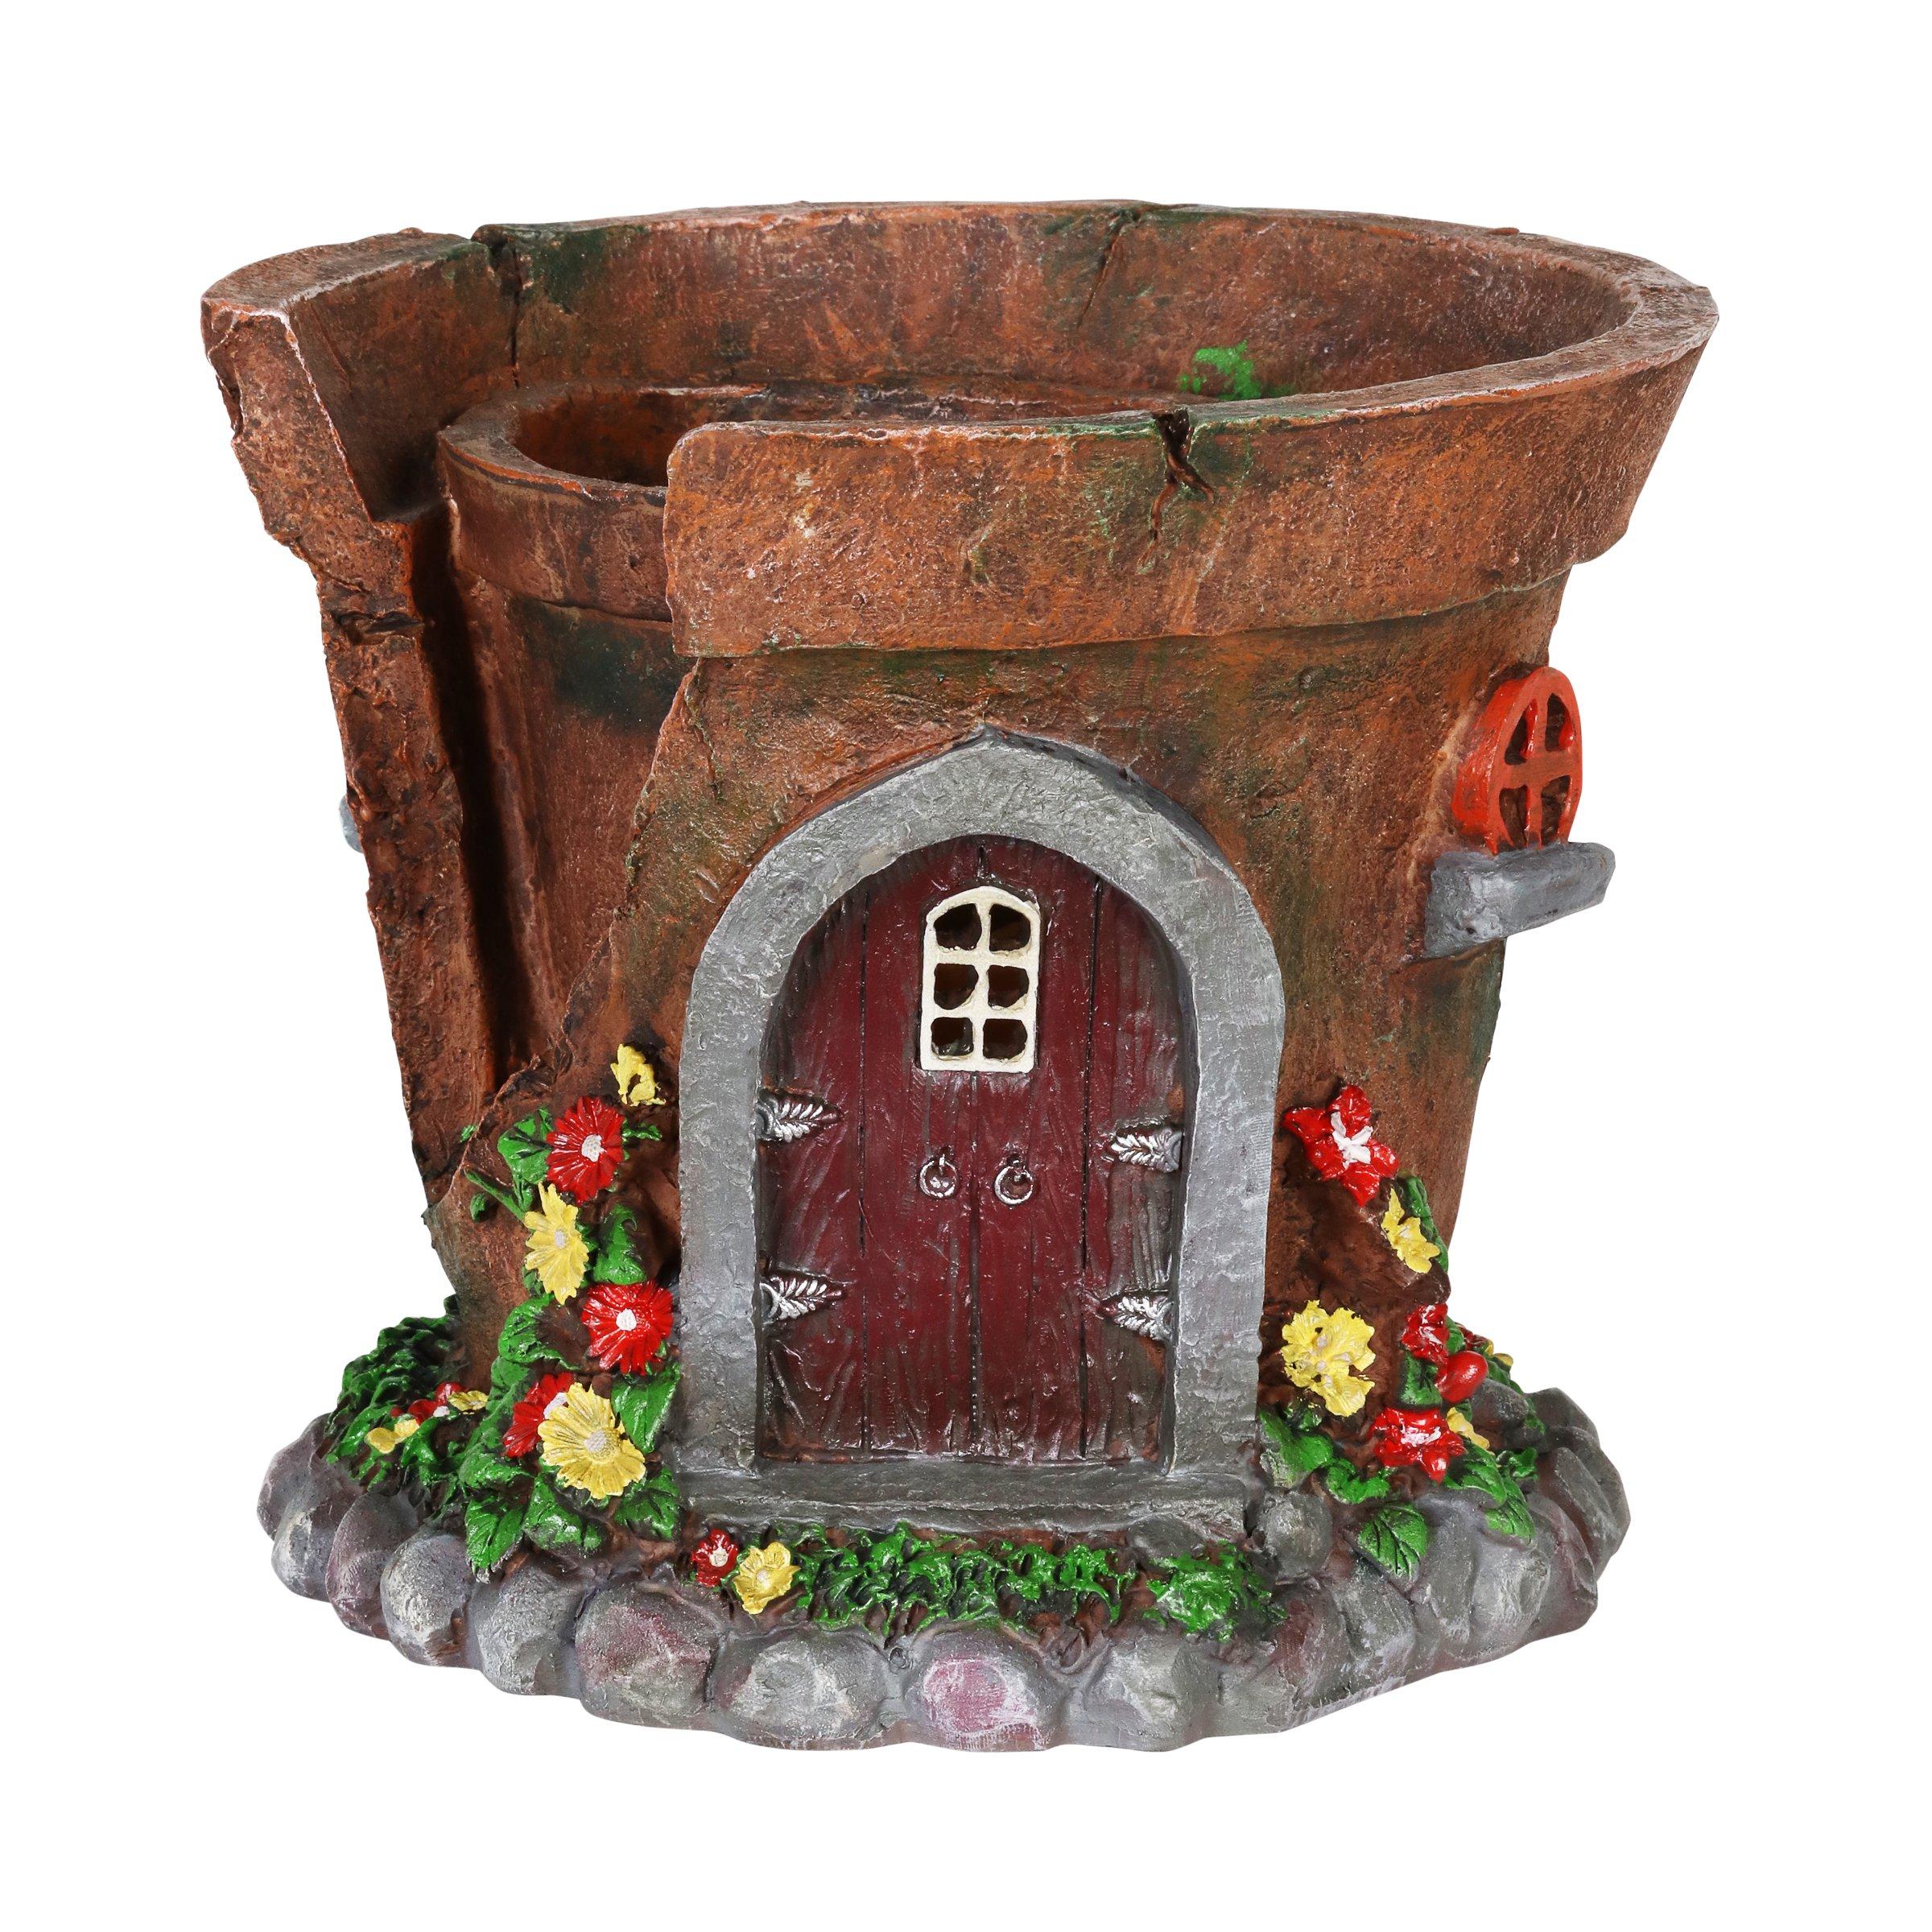 Exhart Gardening Gifts – Fairy House Flower Pot – Pot/Planter w/Solar Garden Lights, Outdoor Use, Fairy Themed Garden Décor, Weather Resistant Resin Statues